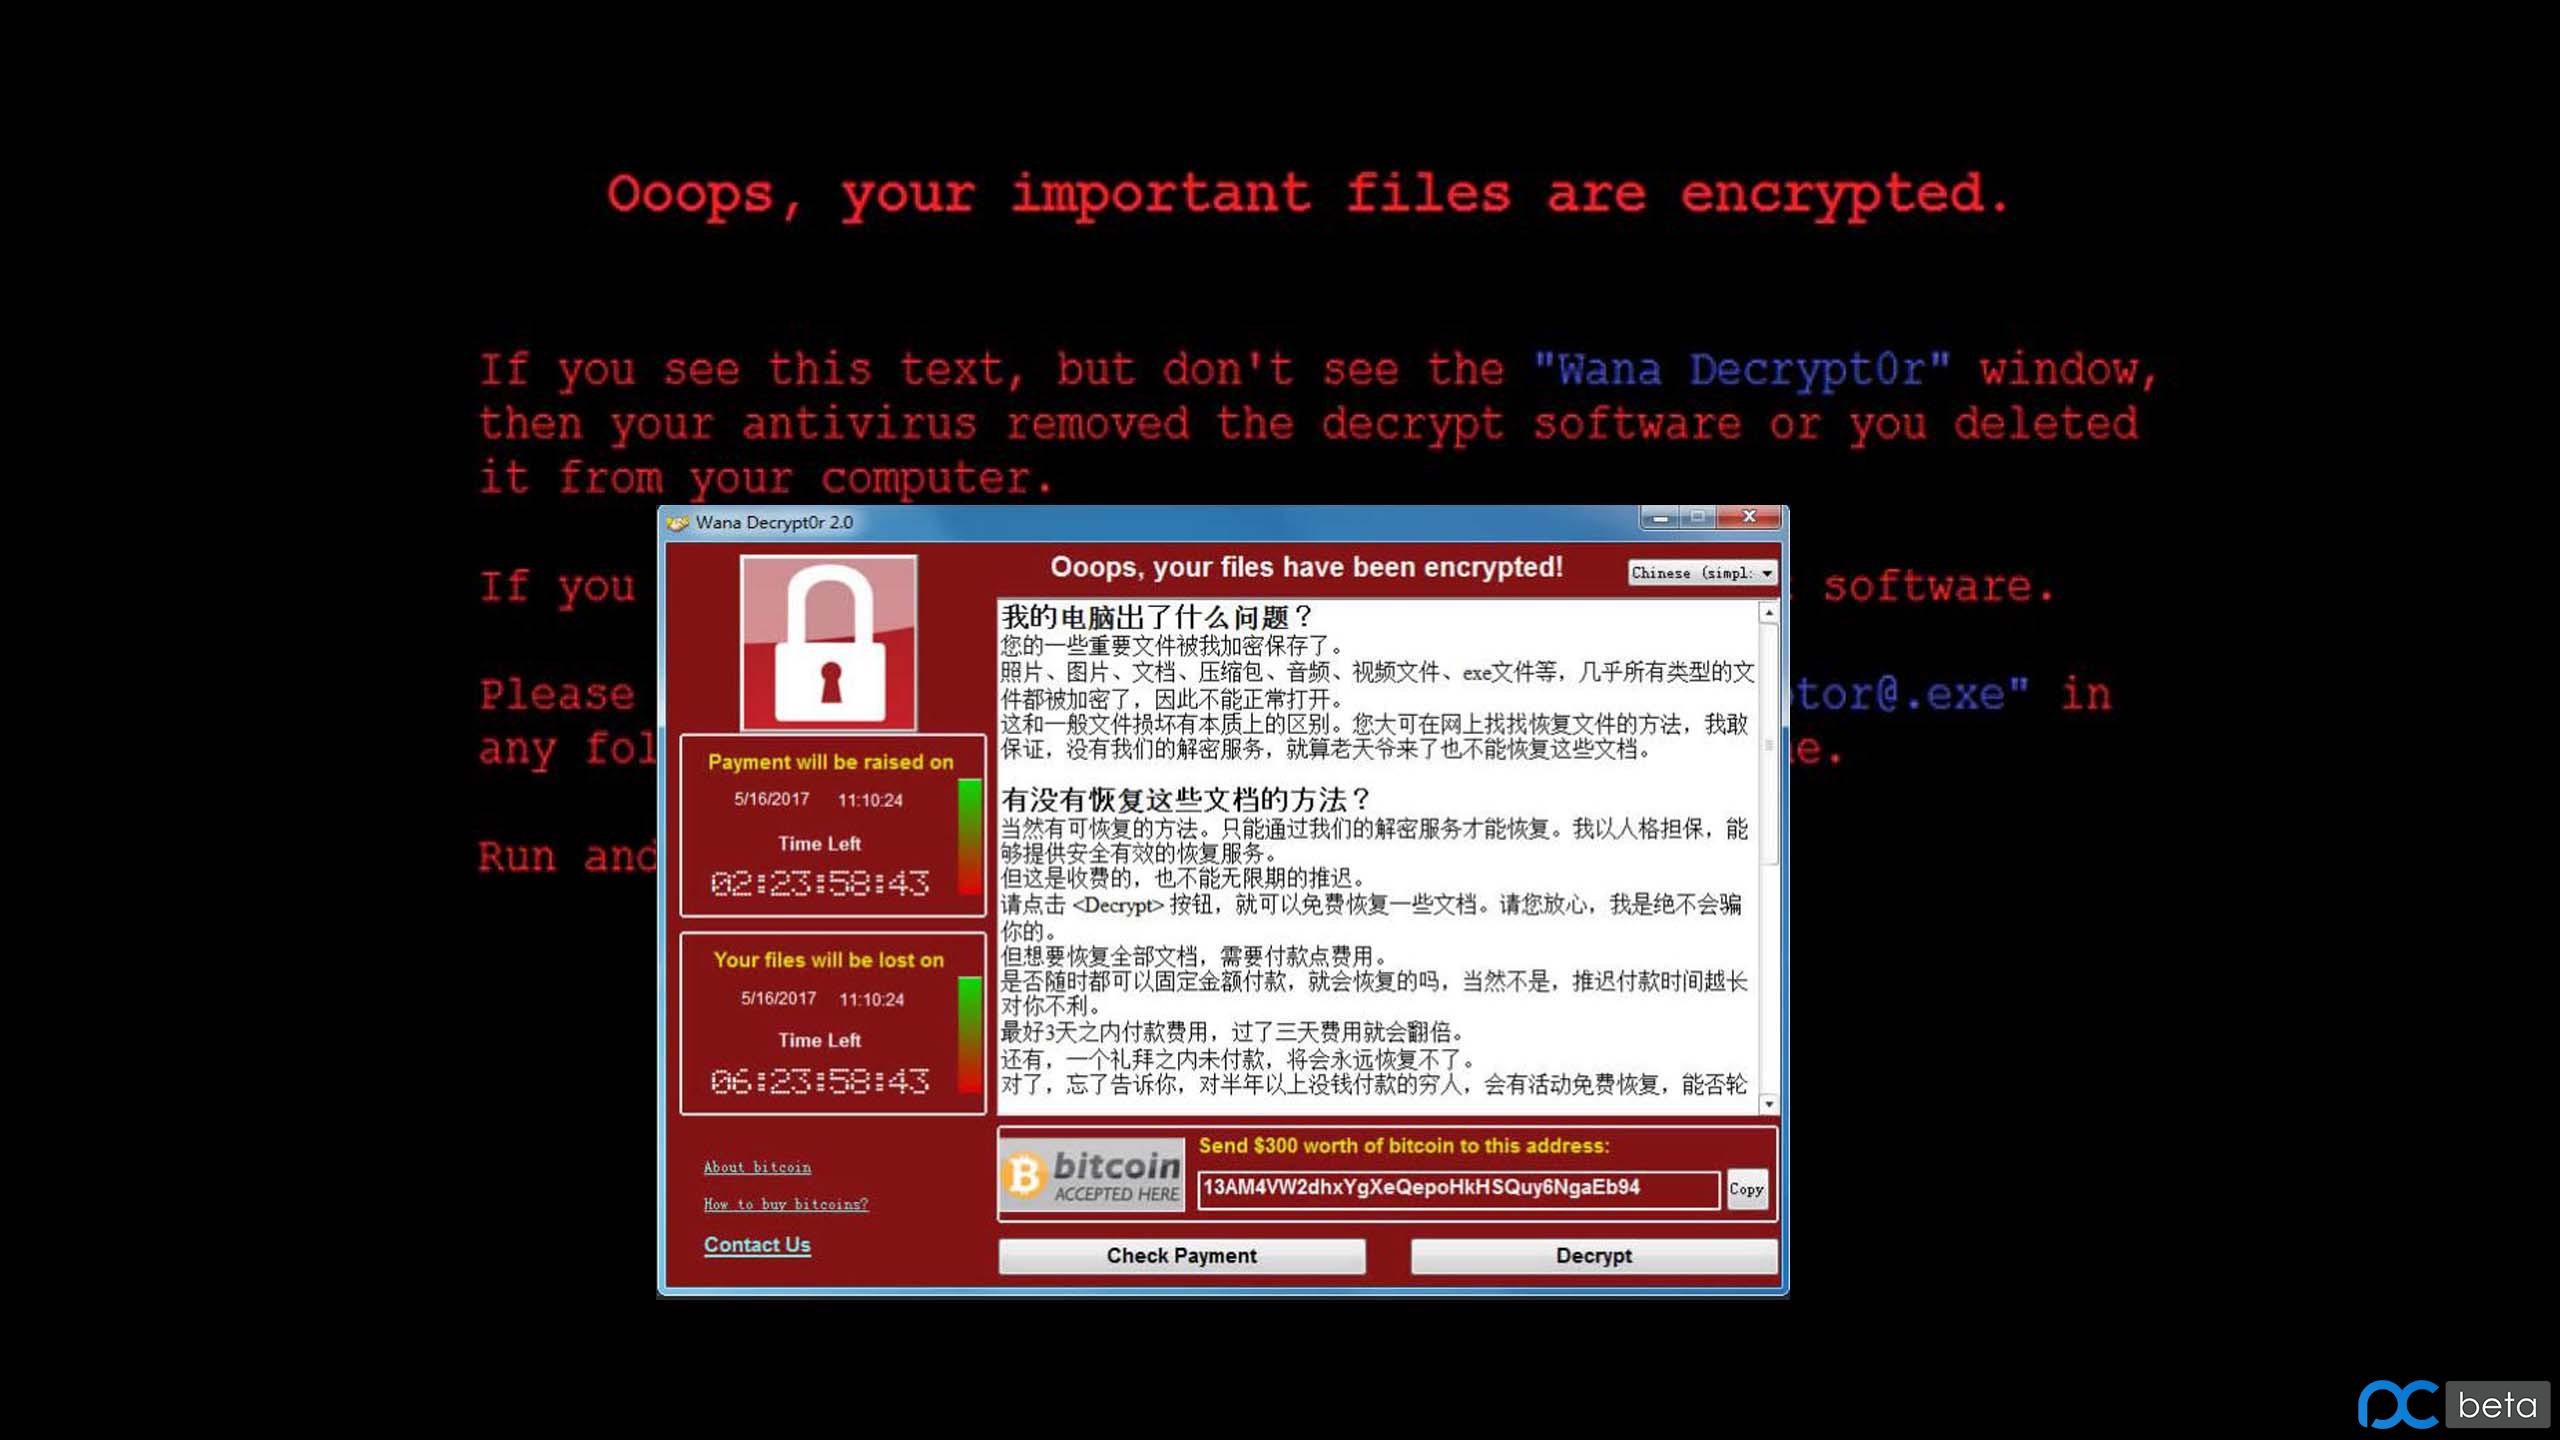 WannaCry_wallpaper_2560x1440-2.jpg